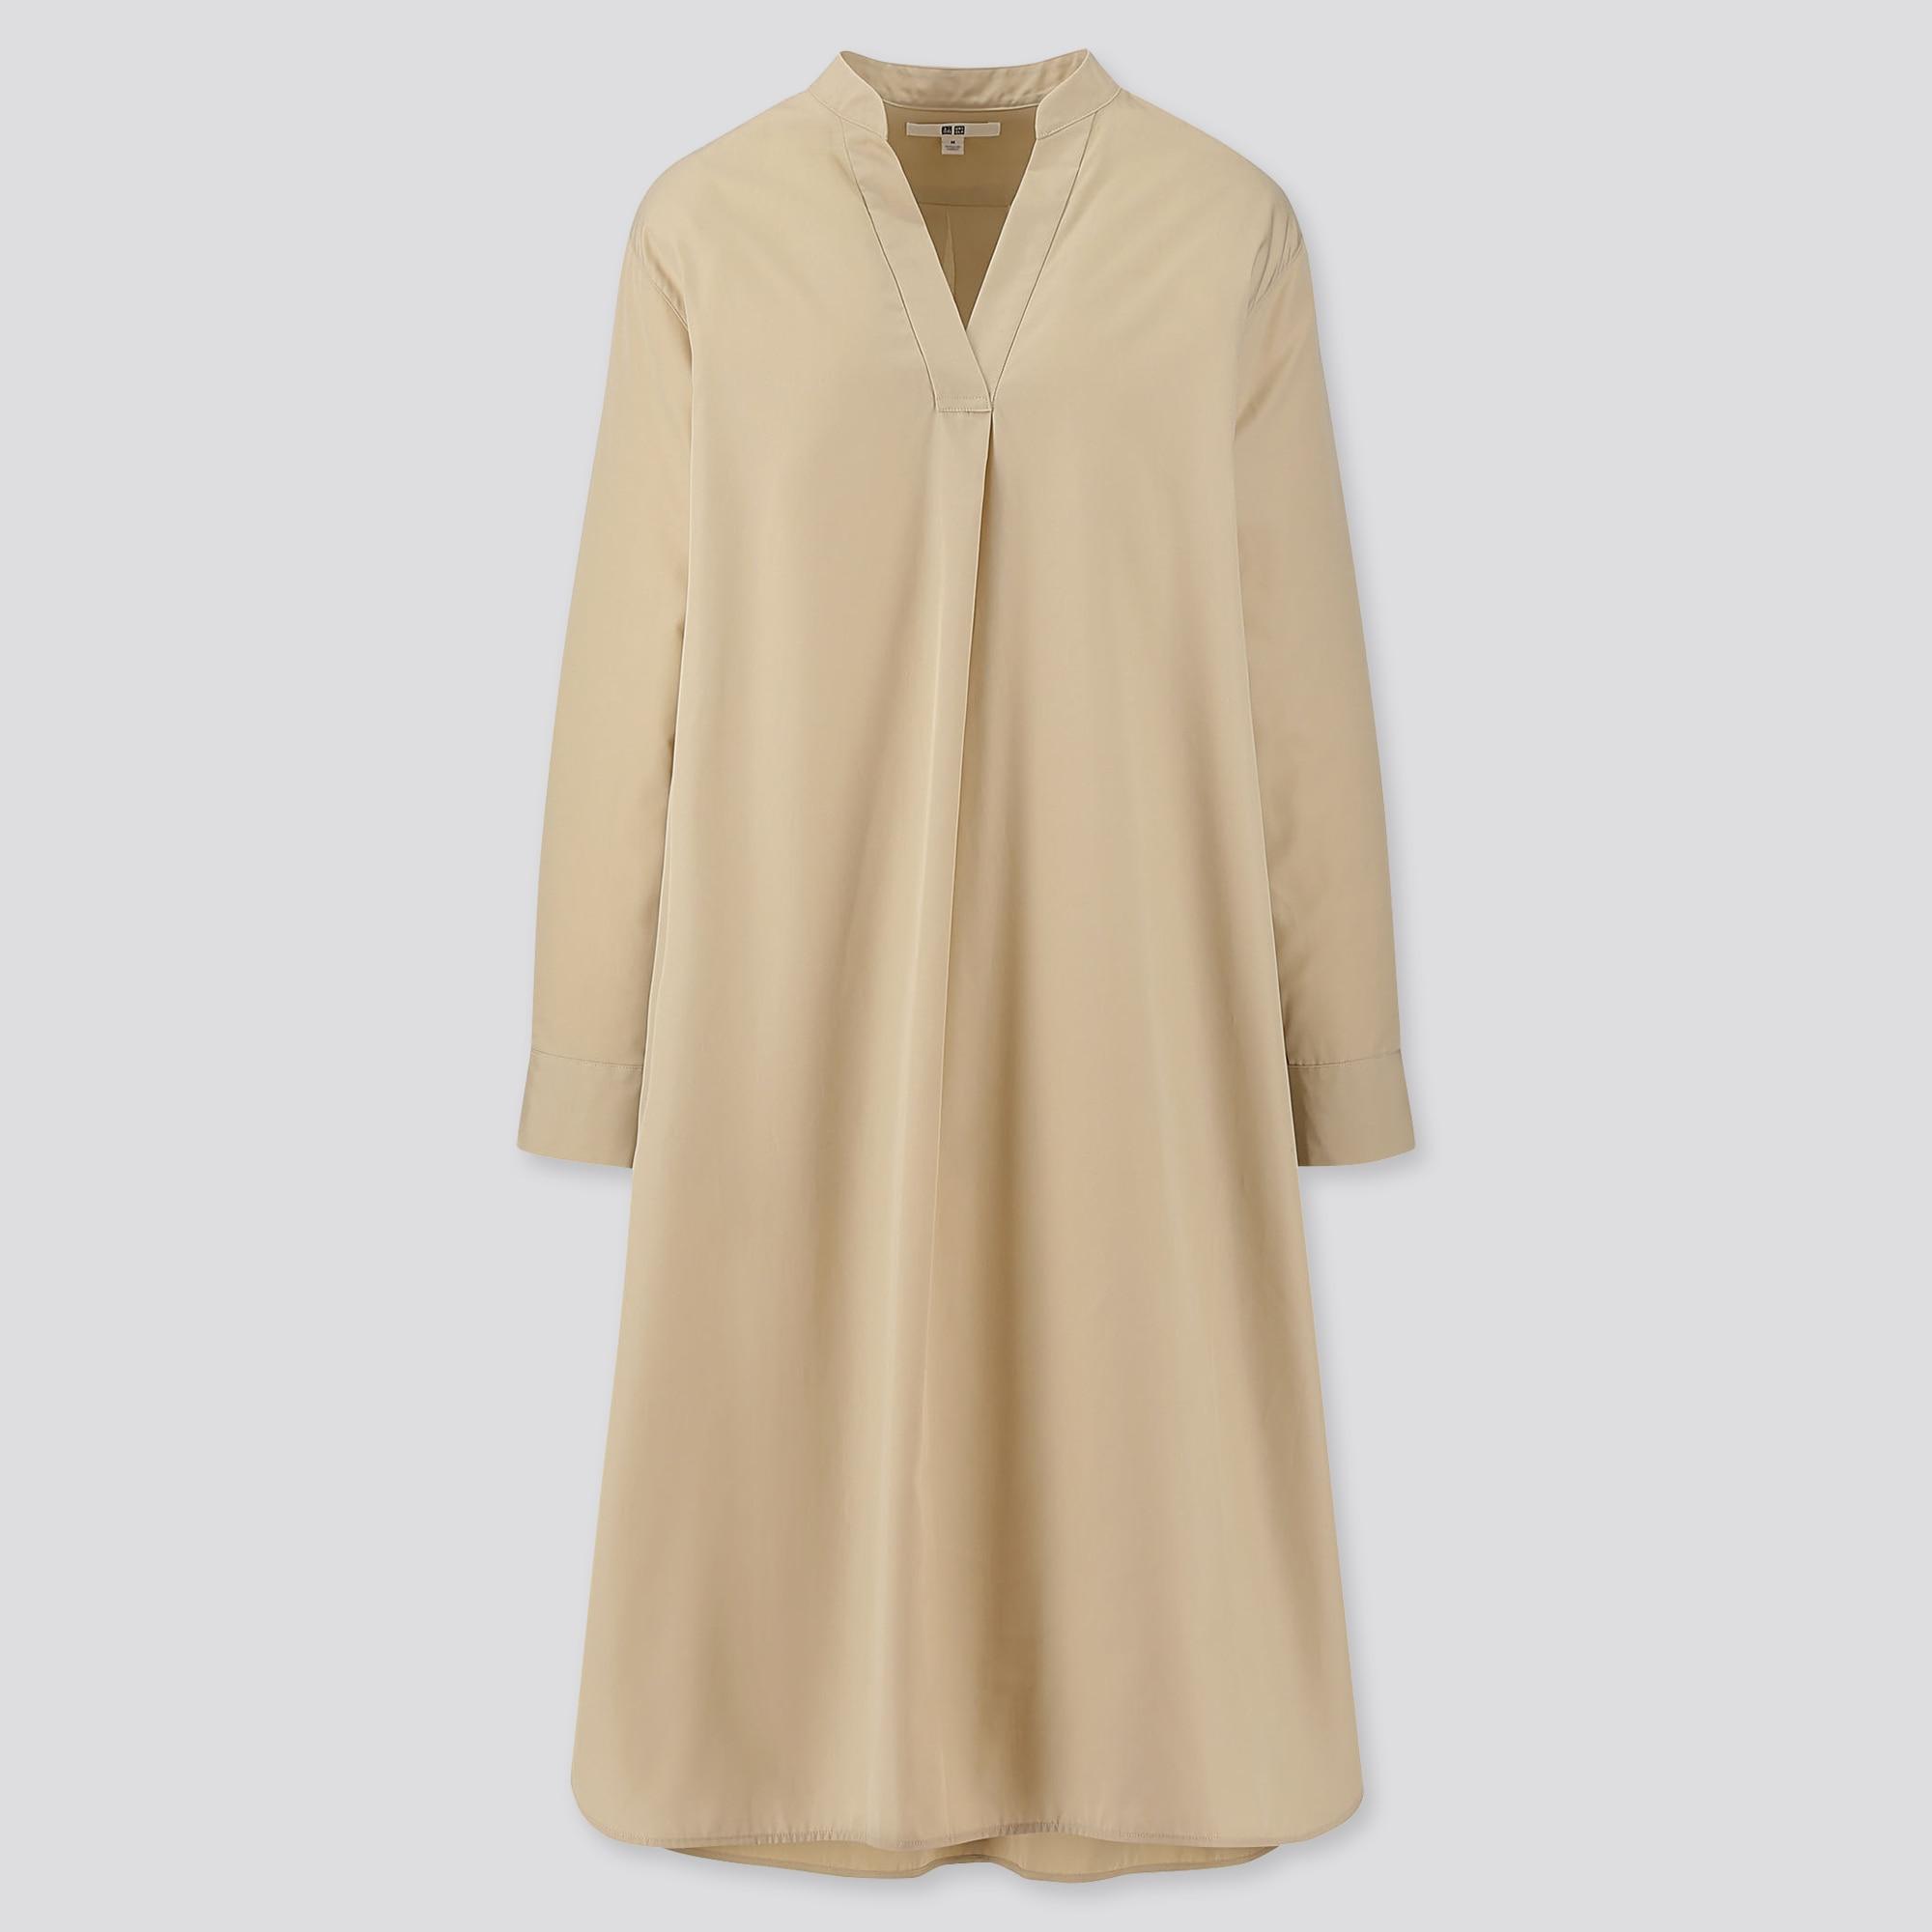 Women Extra Fine Cotton A-Line Split Neck Long Sleeved Dress